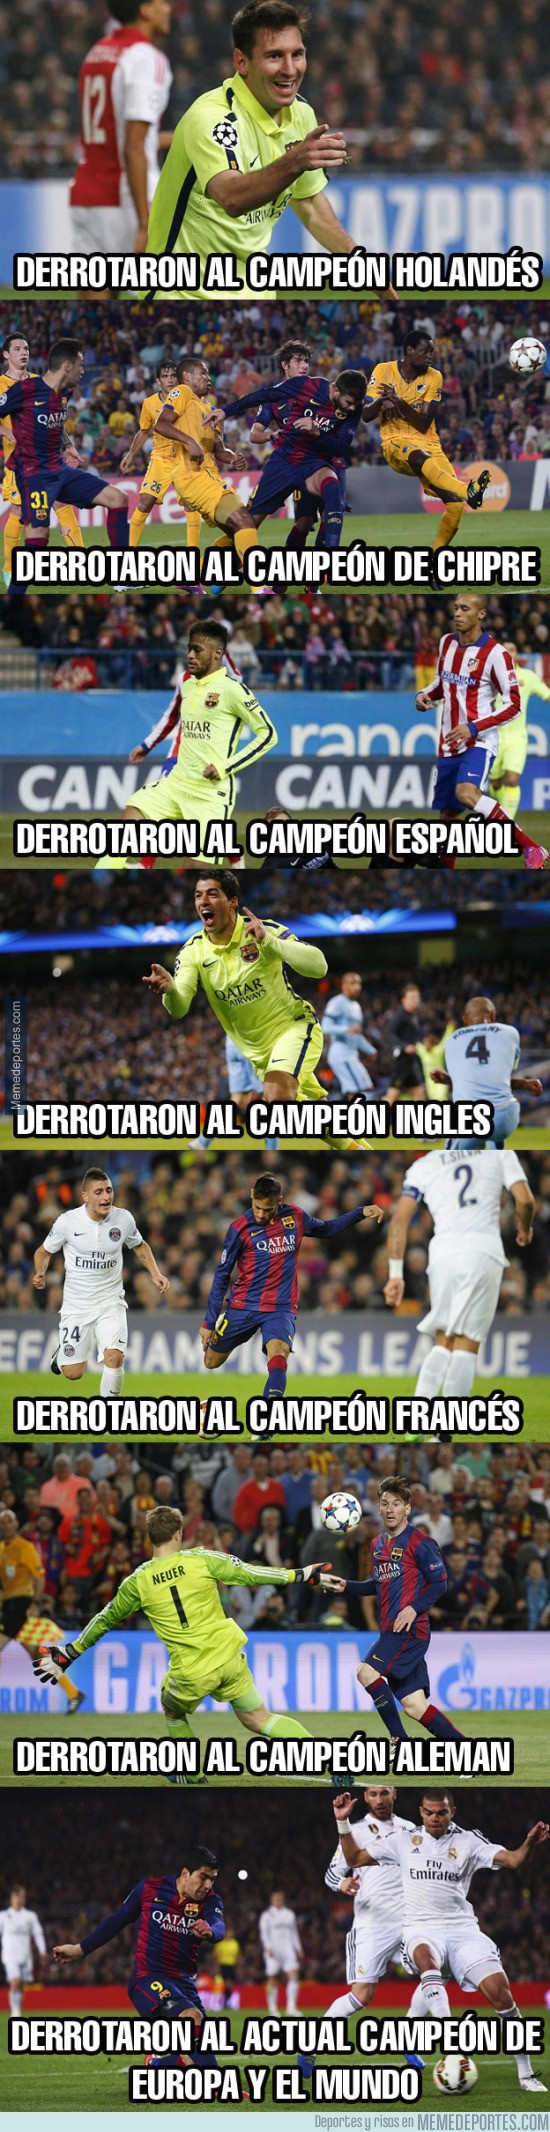 538493 - El Barça esta temporada, admirable